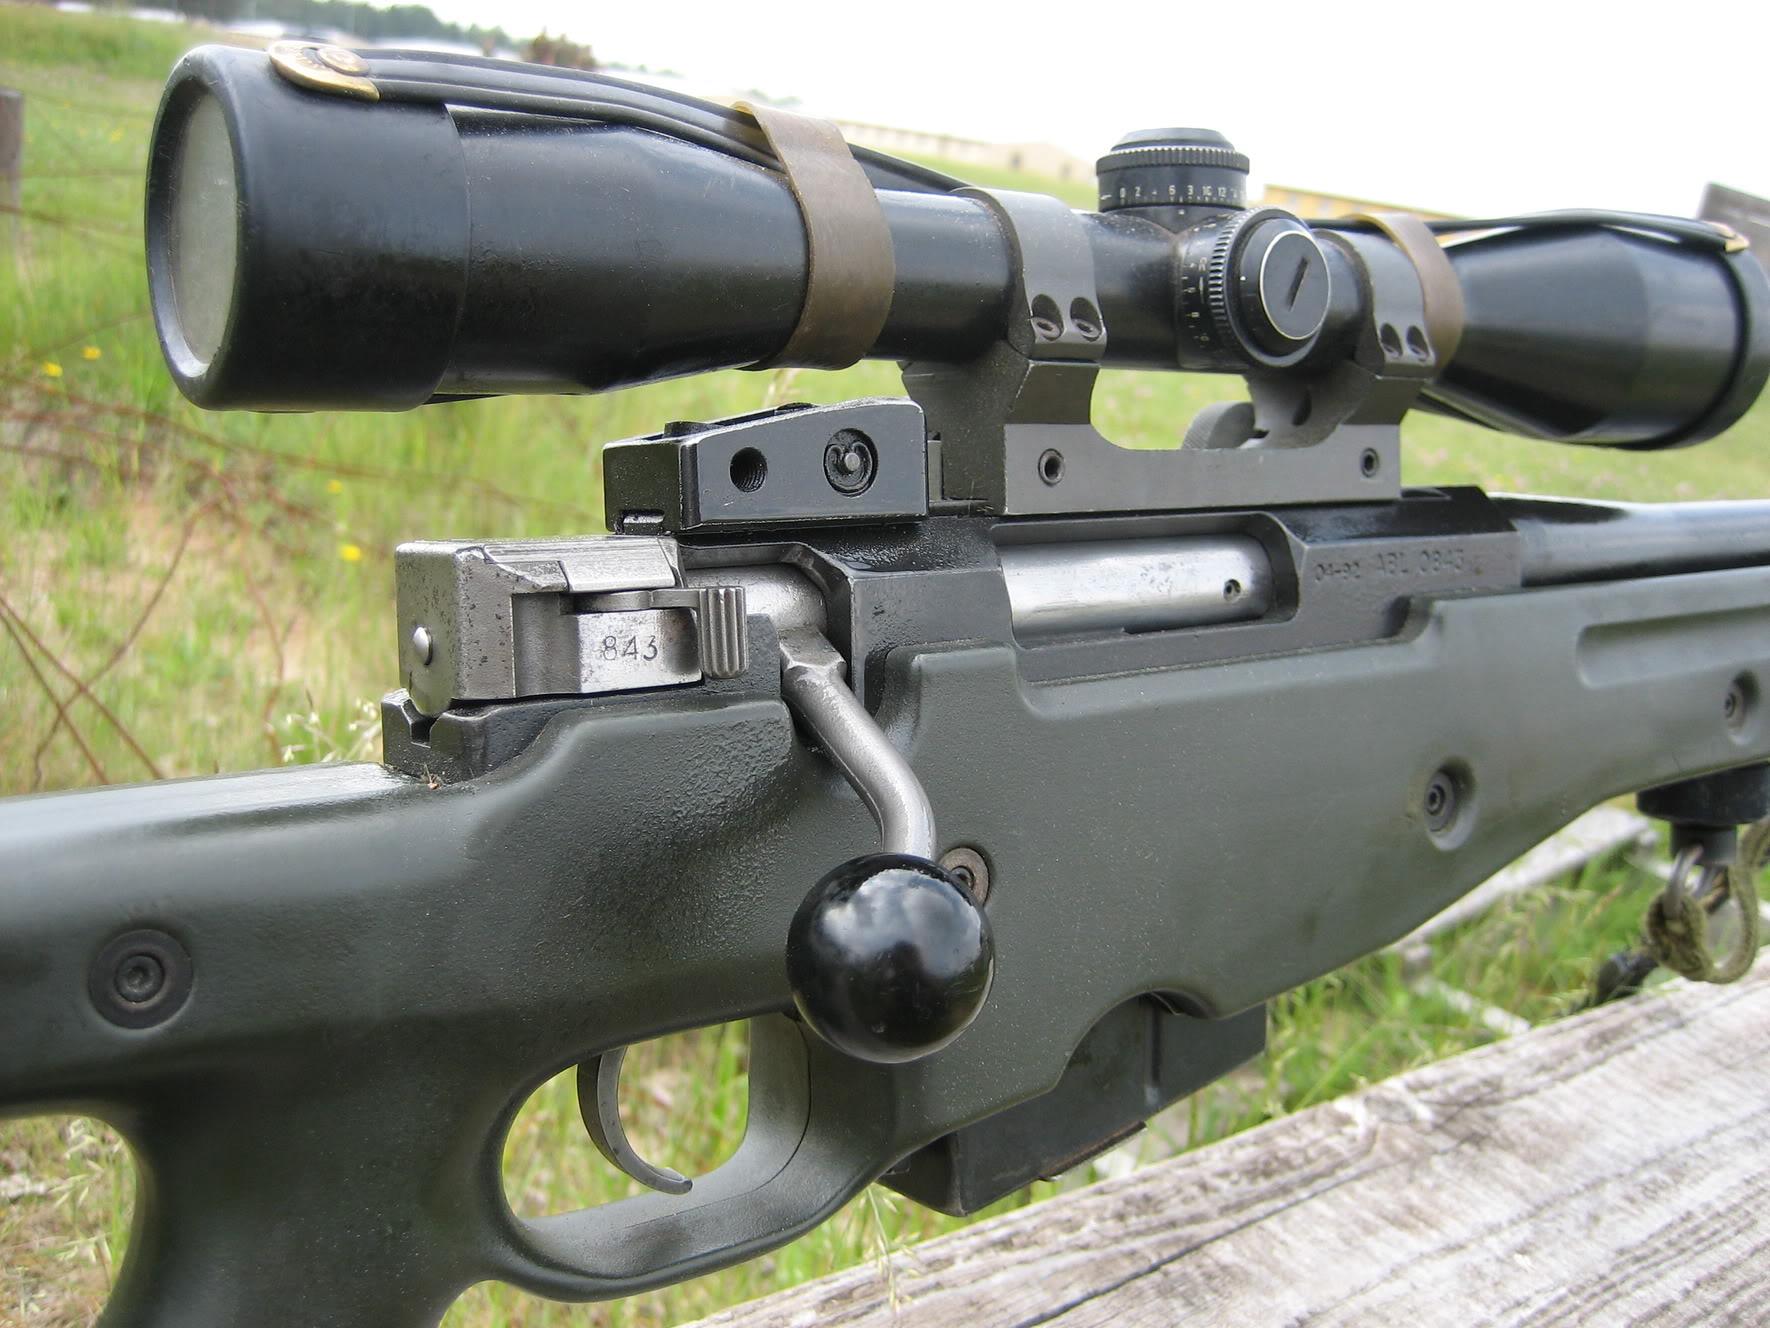 AW 7.62mm rifle,  Belgian Army sniperrifle GTA2008_0485